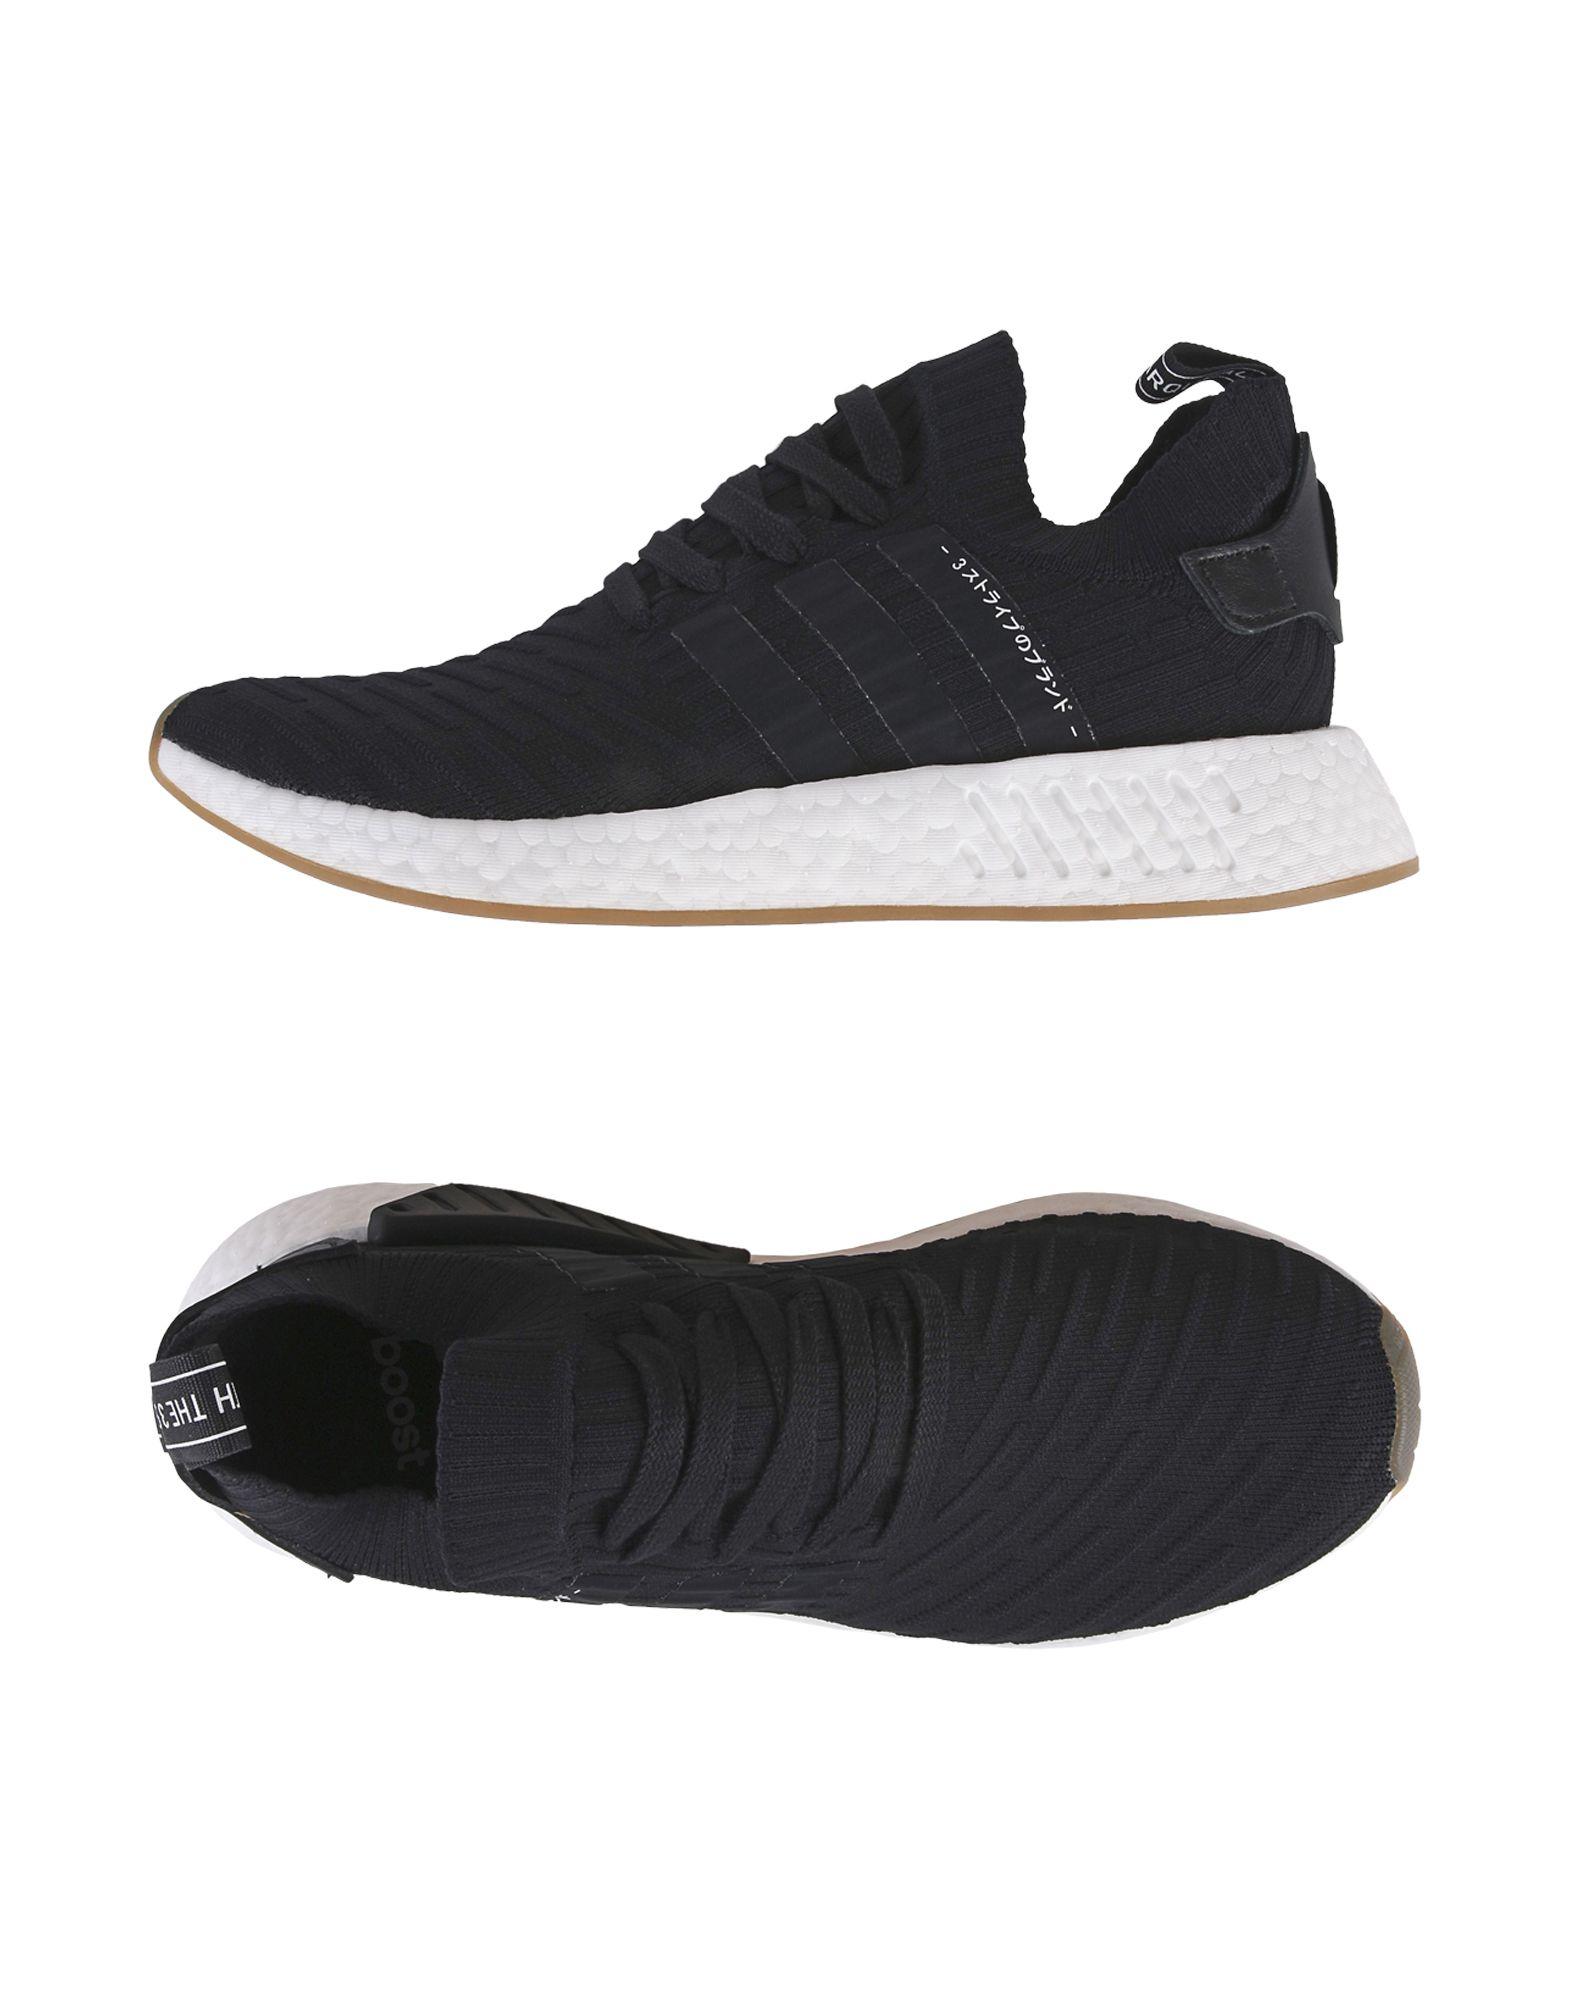 Adidas Originals Nmd_R2 Pk - Sneakers - online Men Adidas Originals Sneakers online - on  Australia - 11382355NS f6942c